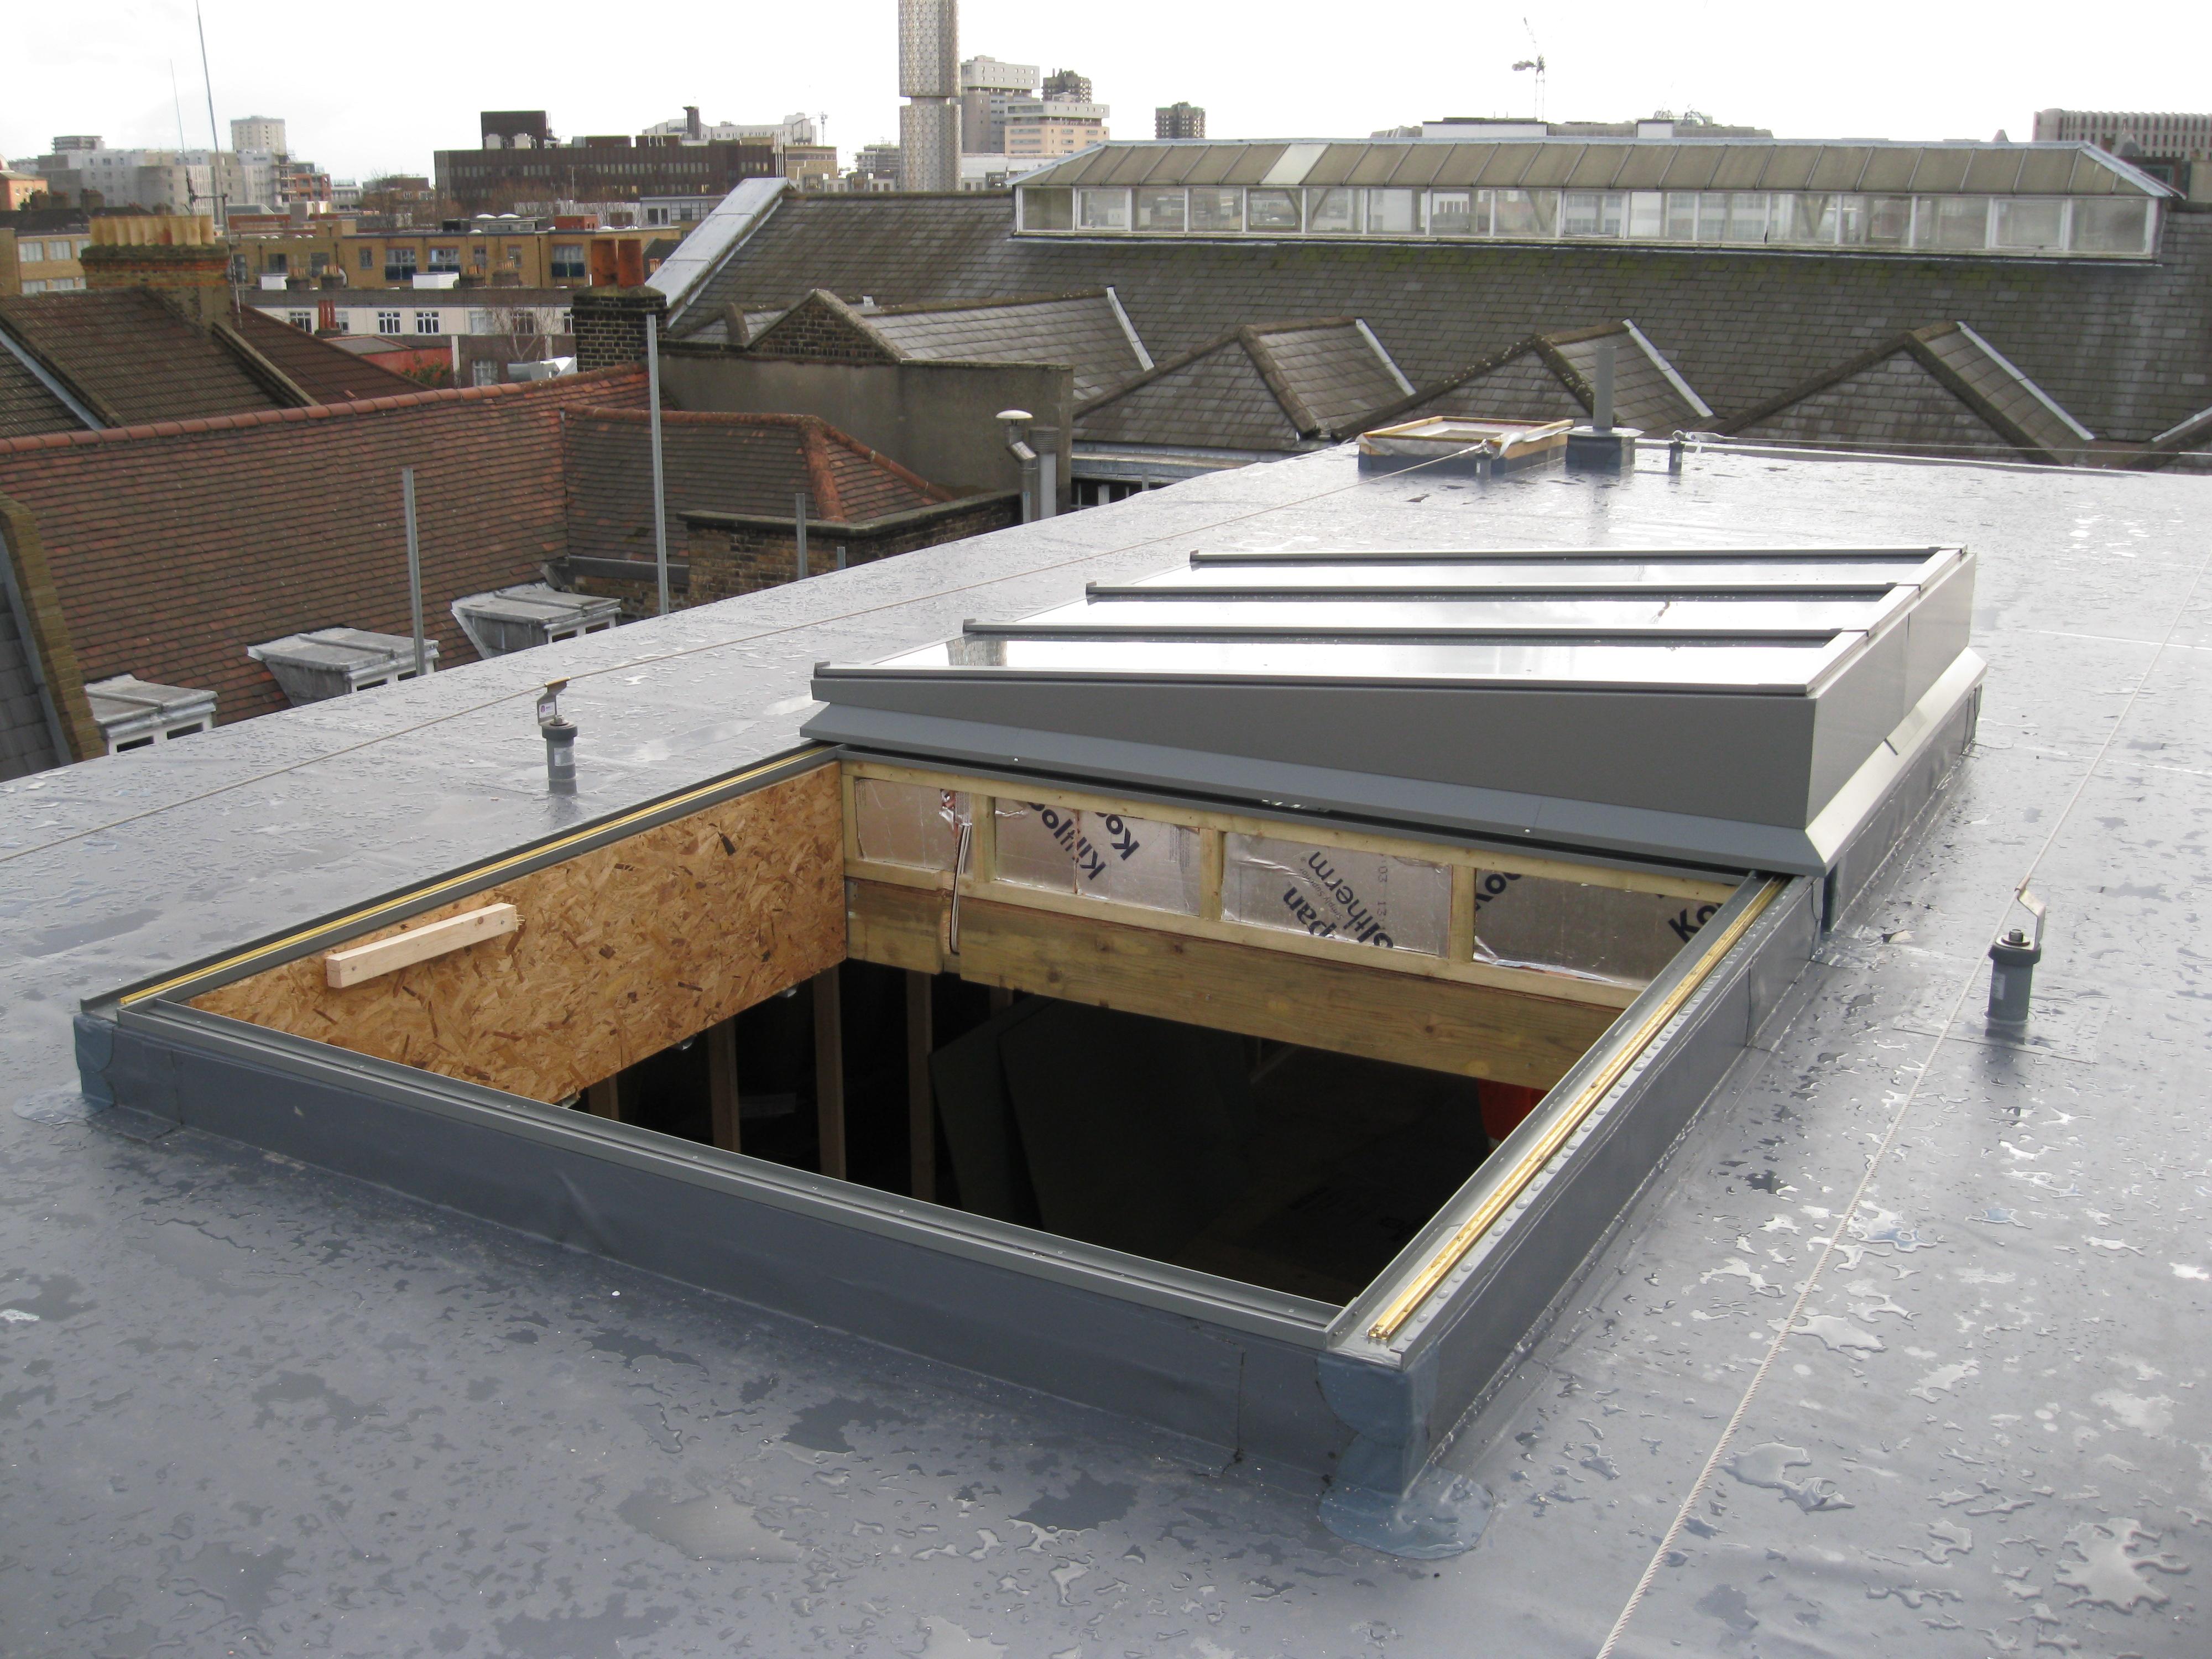 GRHM Fully Retracting, Single Pitch, Slide Open, Glazed Roof, Rooflight, Skylight, Roof Lantern